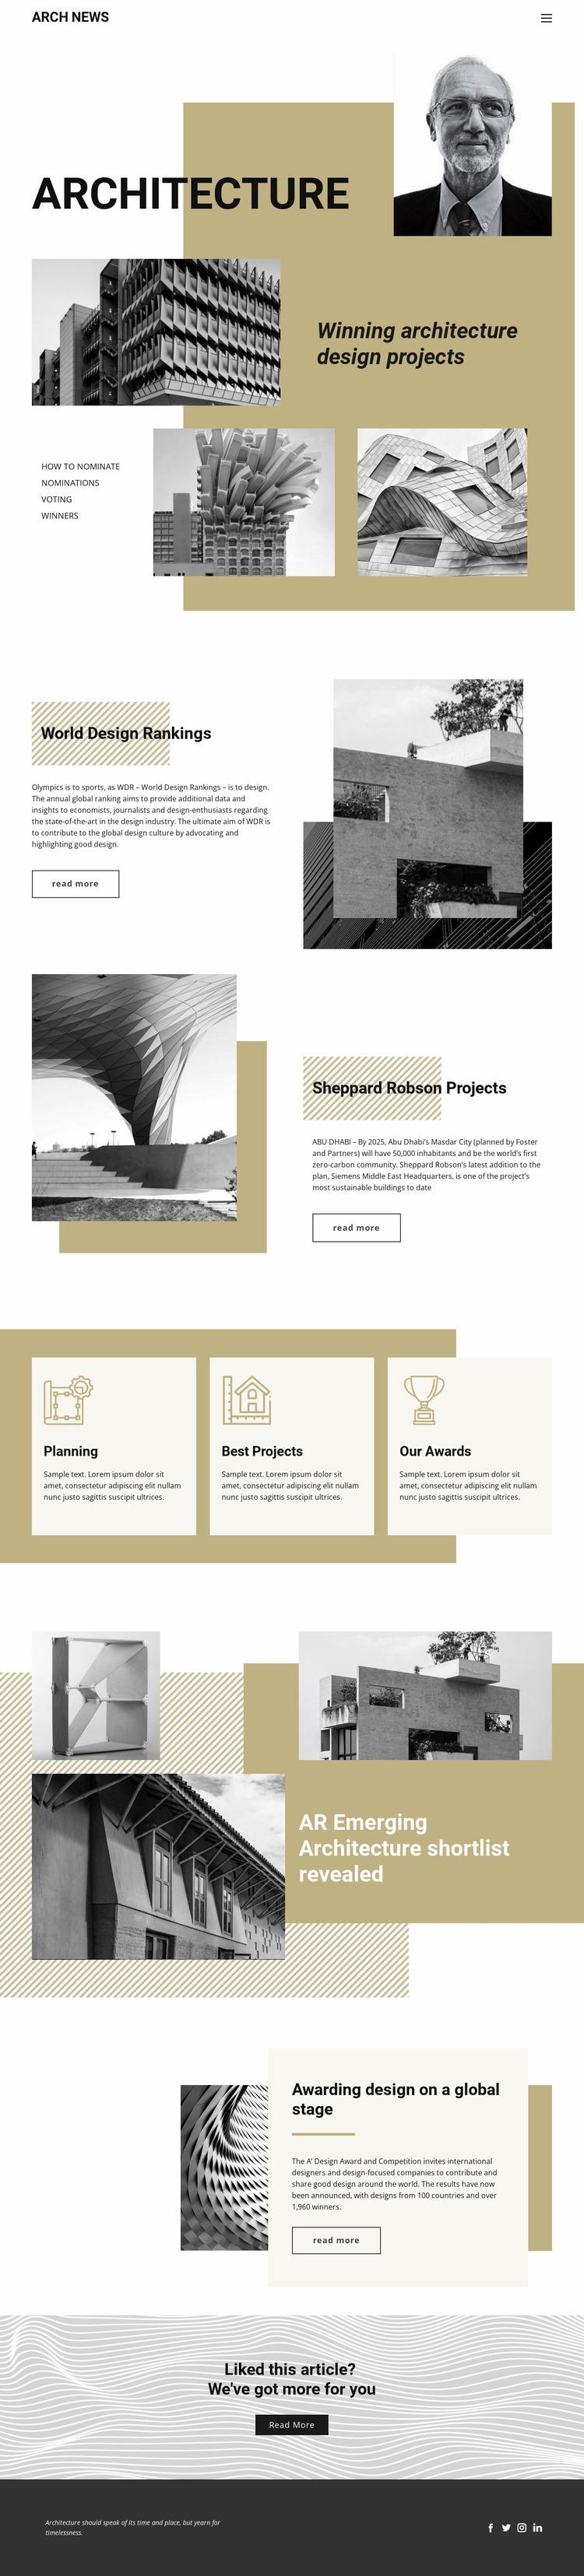 Design of Architecture Website Mockup